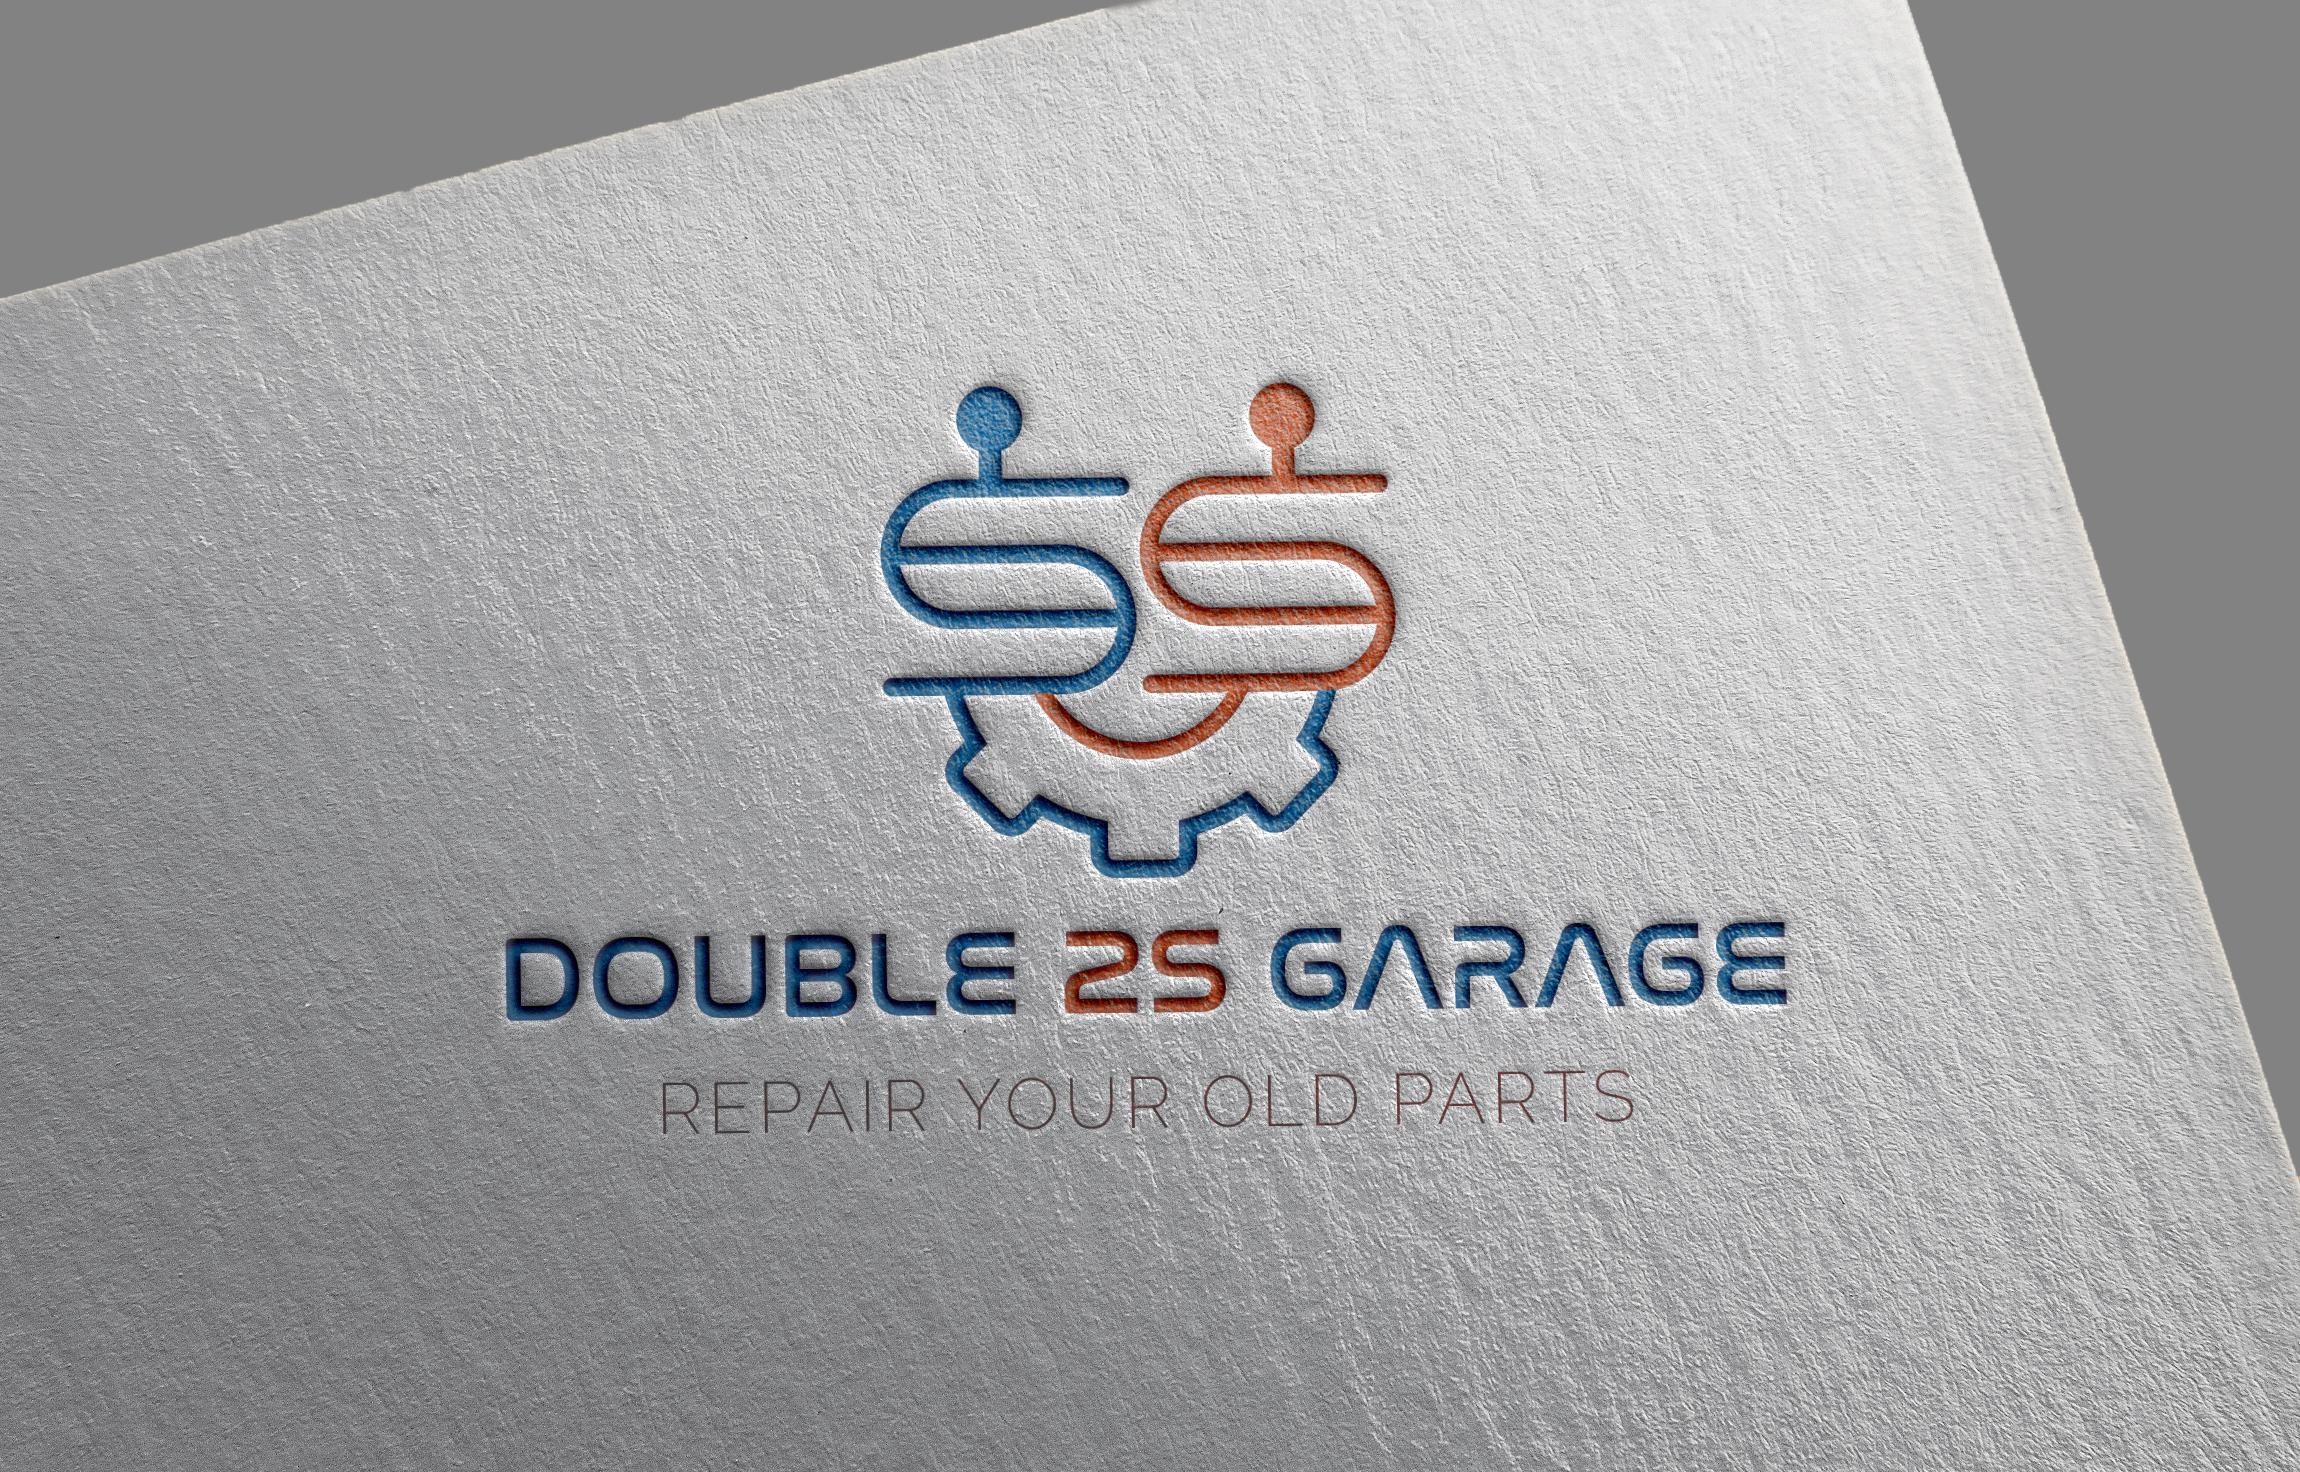 do urgent professional logo design for your business